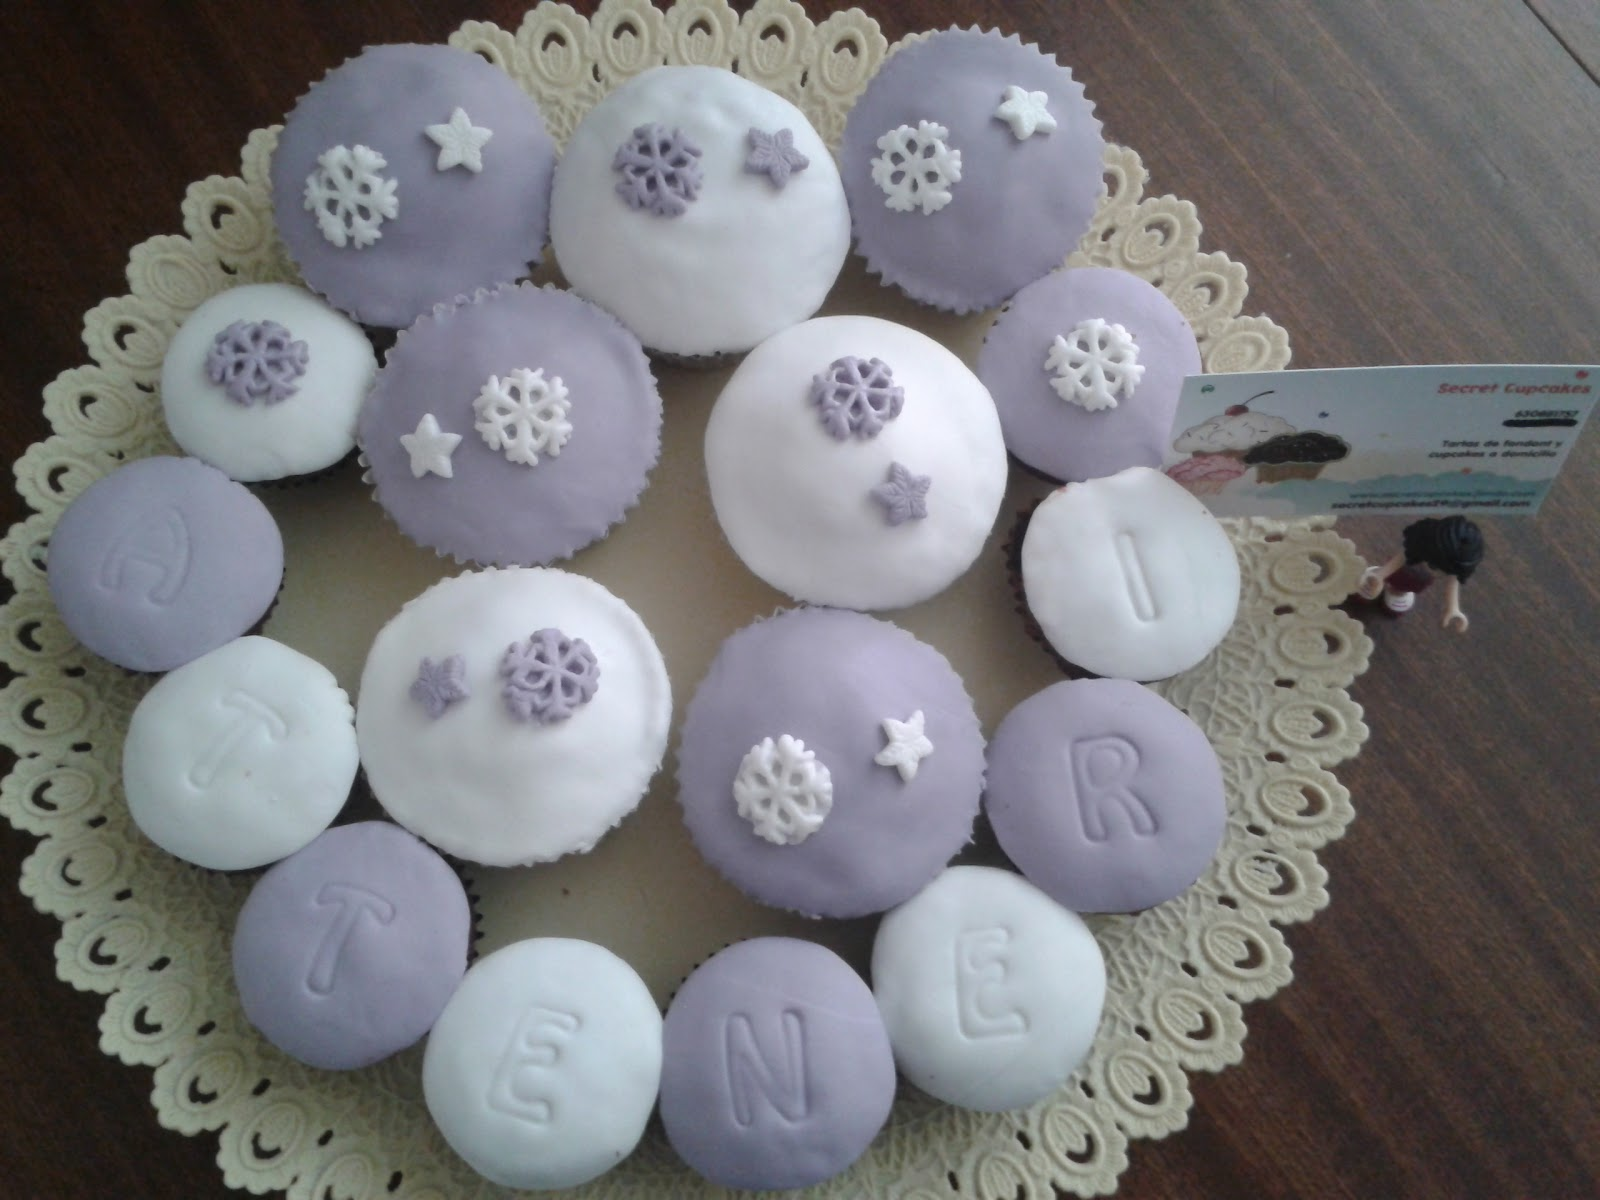 Cupcakes tenerife m s mosnter high tarta de abbey bominable - Cupcakes tenerife ...